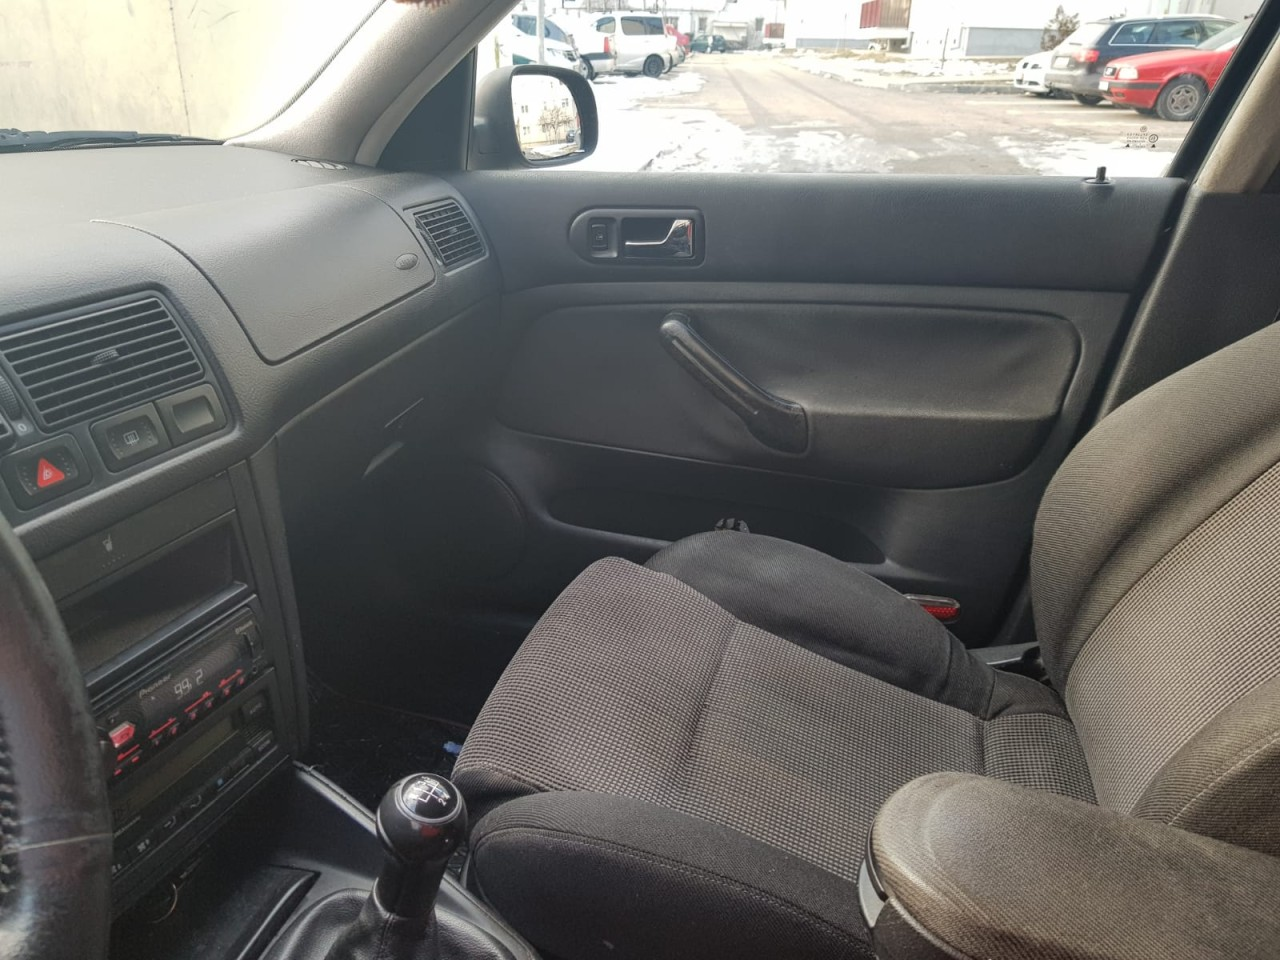 VW Golf 1.6 1998